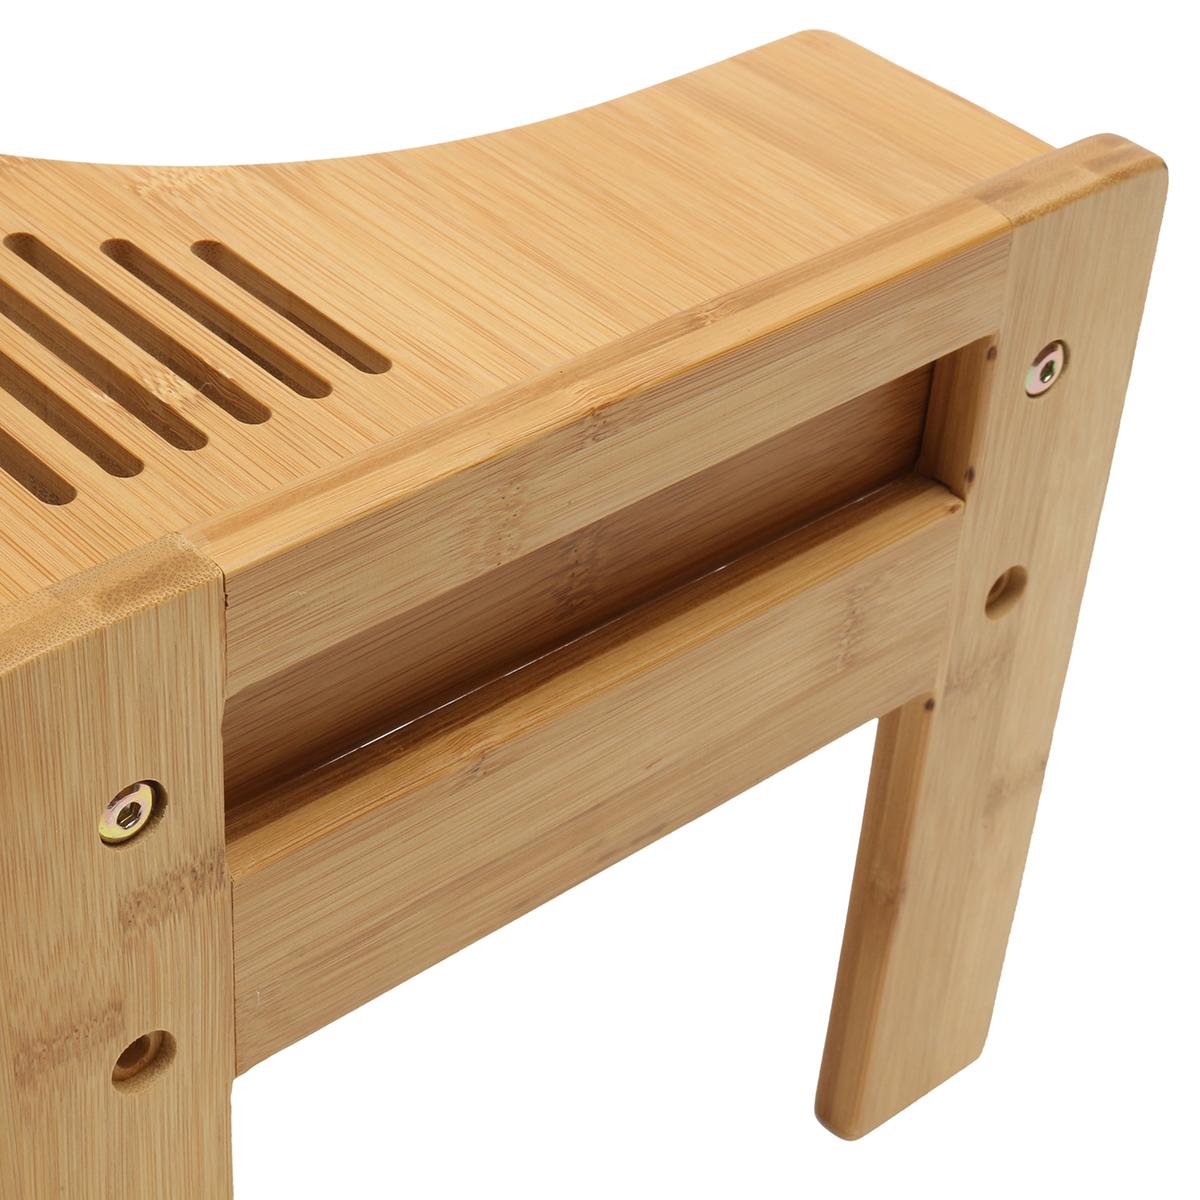 WC Pro Holz Toilettenhocker Hocker Bambus Fußhocker Töpfchen Komfort Piles Neu